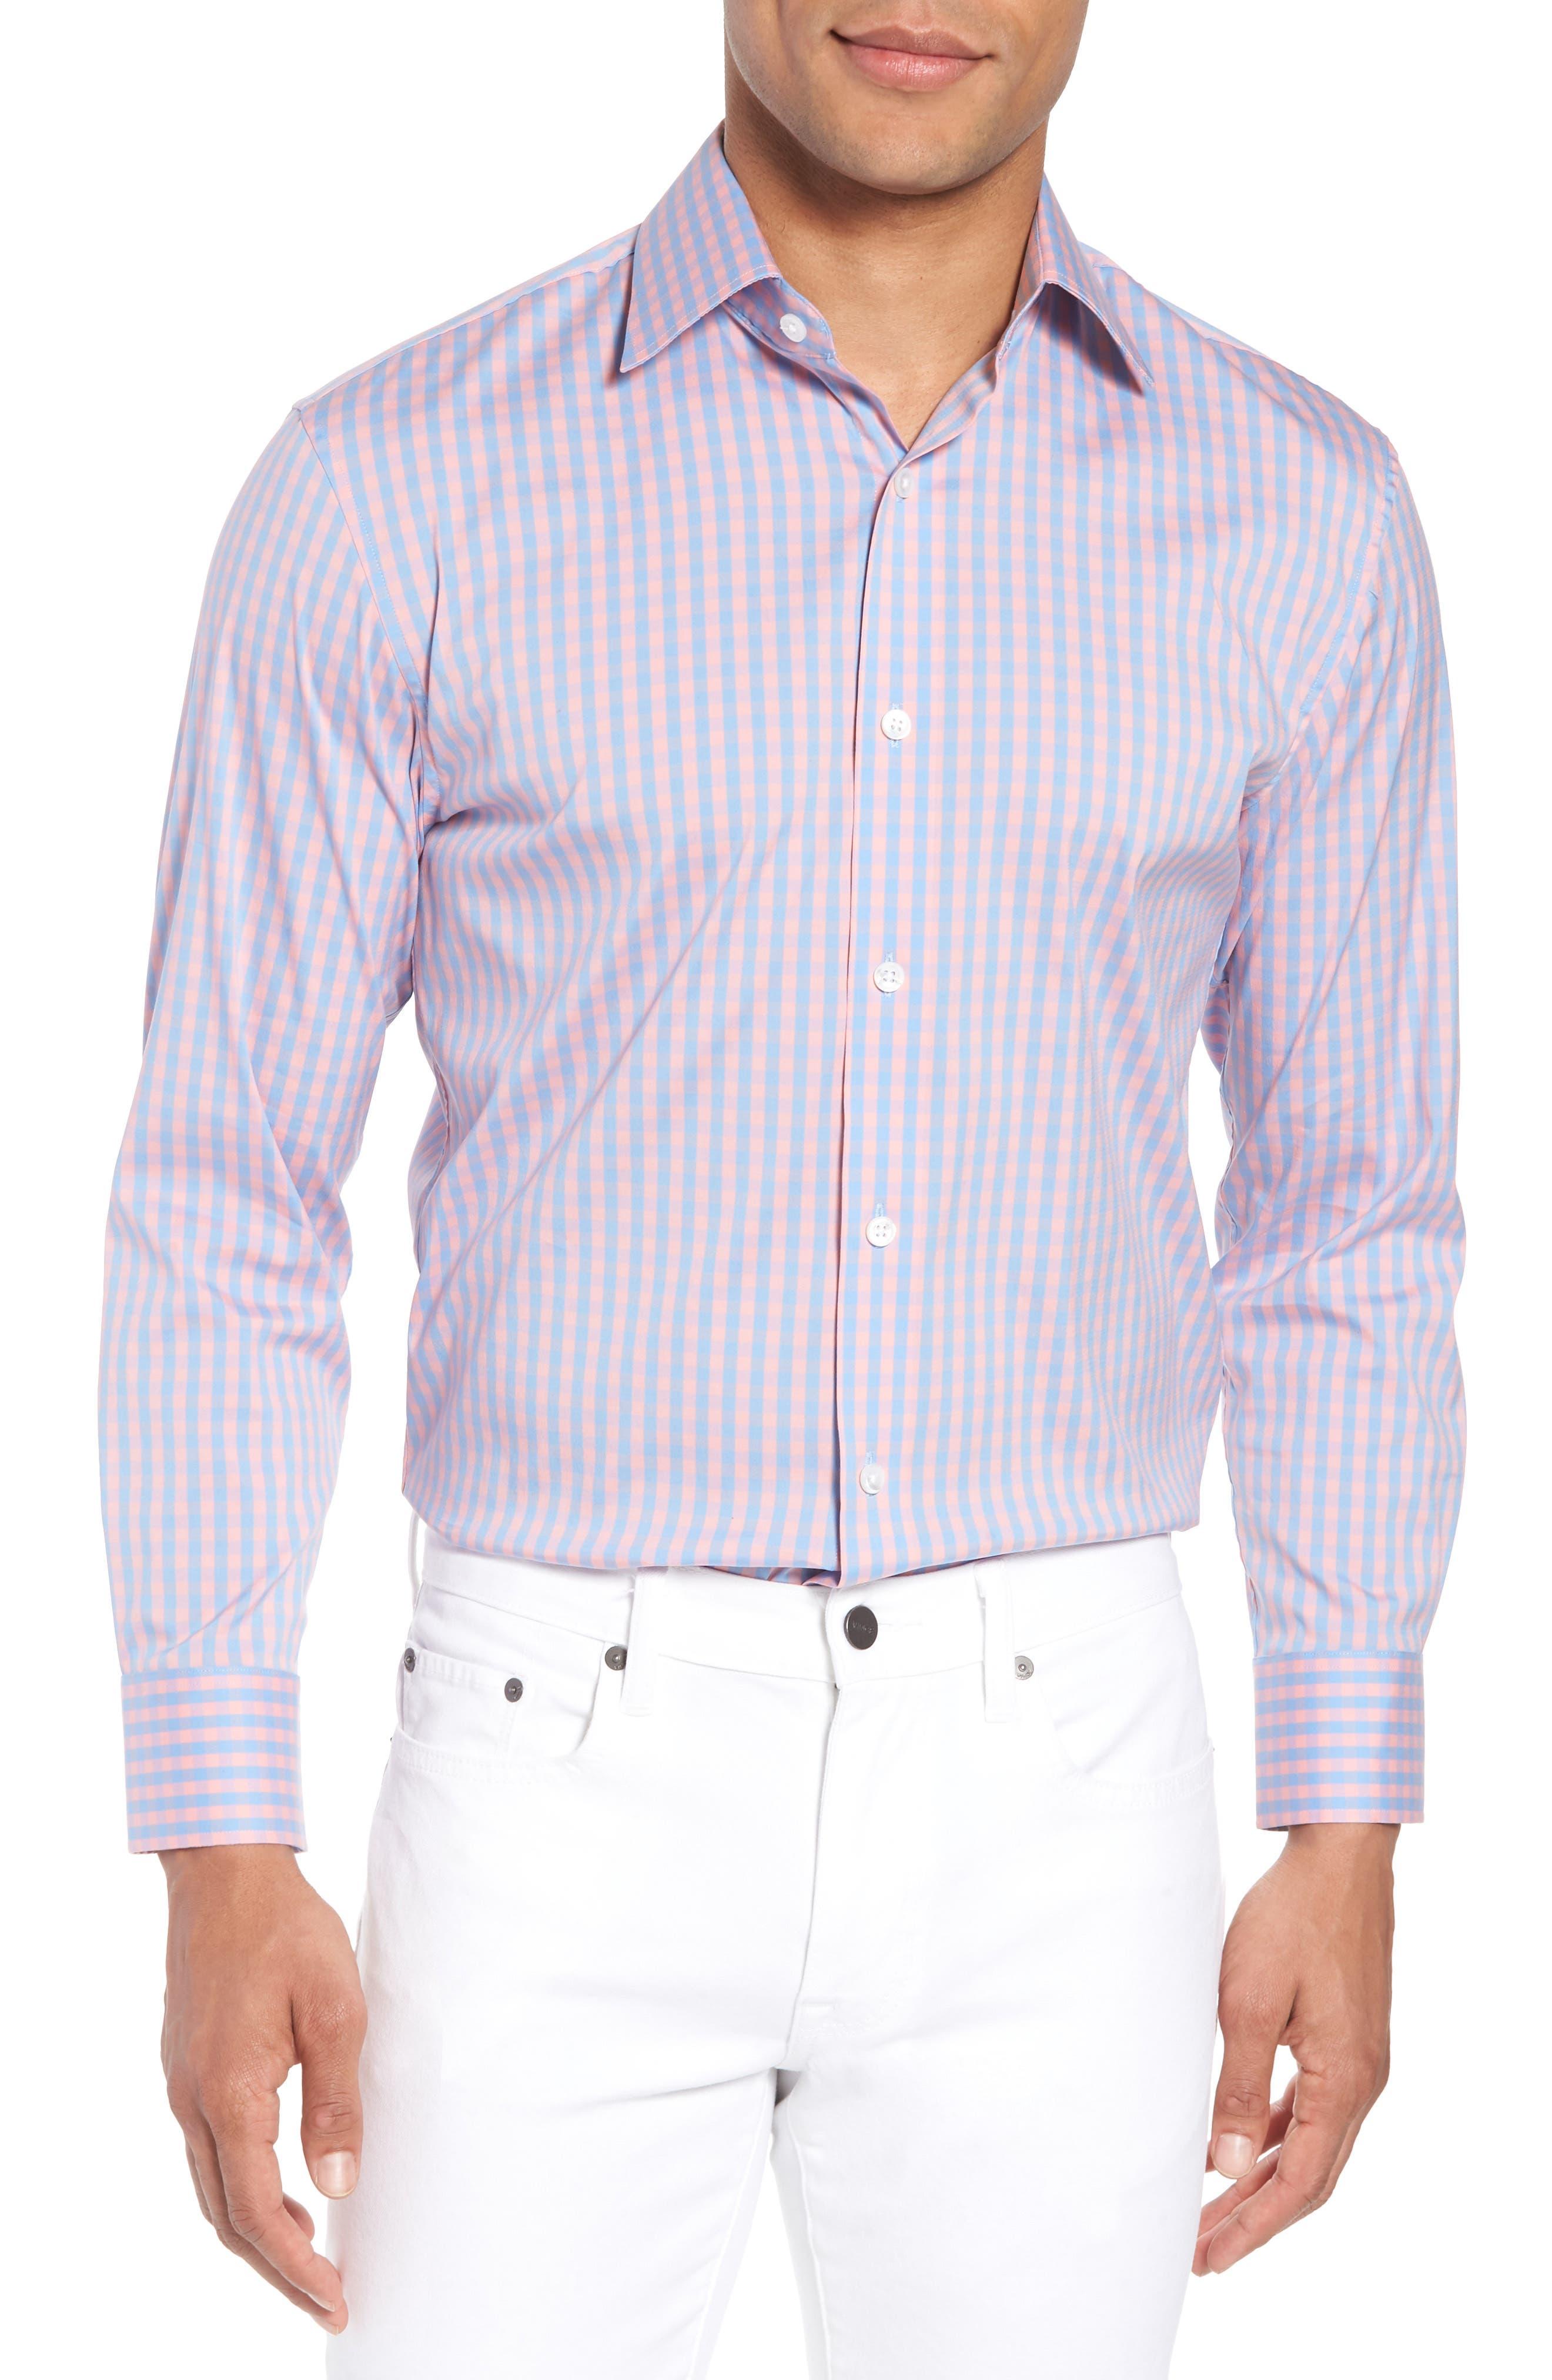 Jetsetter Slim Fit Stretch Check Dress Shirt,                         Main,                         color,